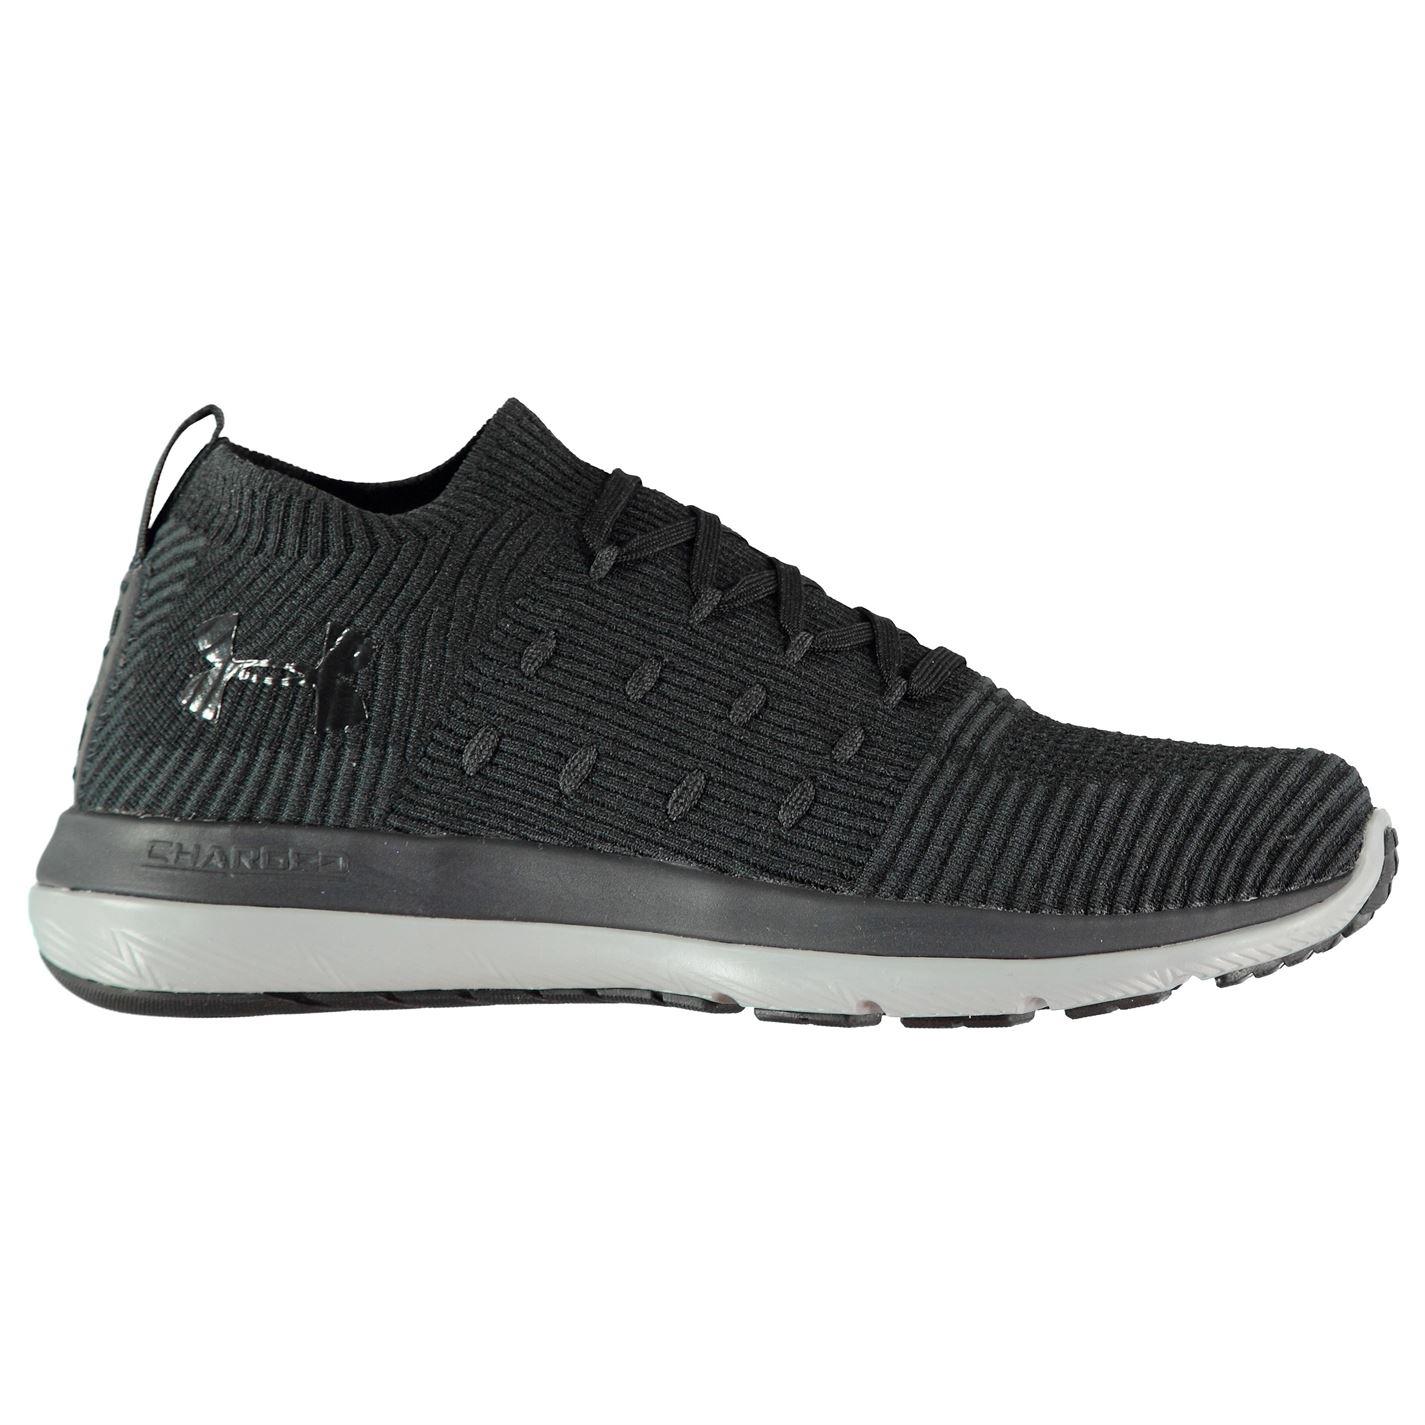 Nike Lunar Swift Plus 4 Mens Running Shoes